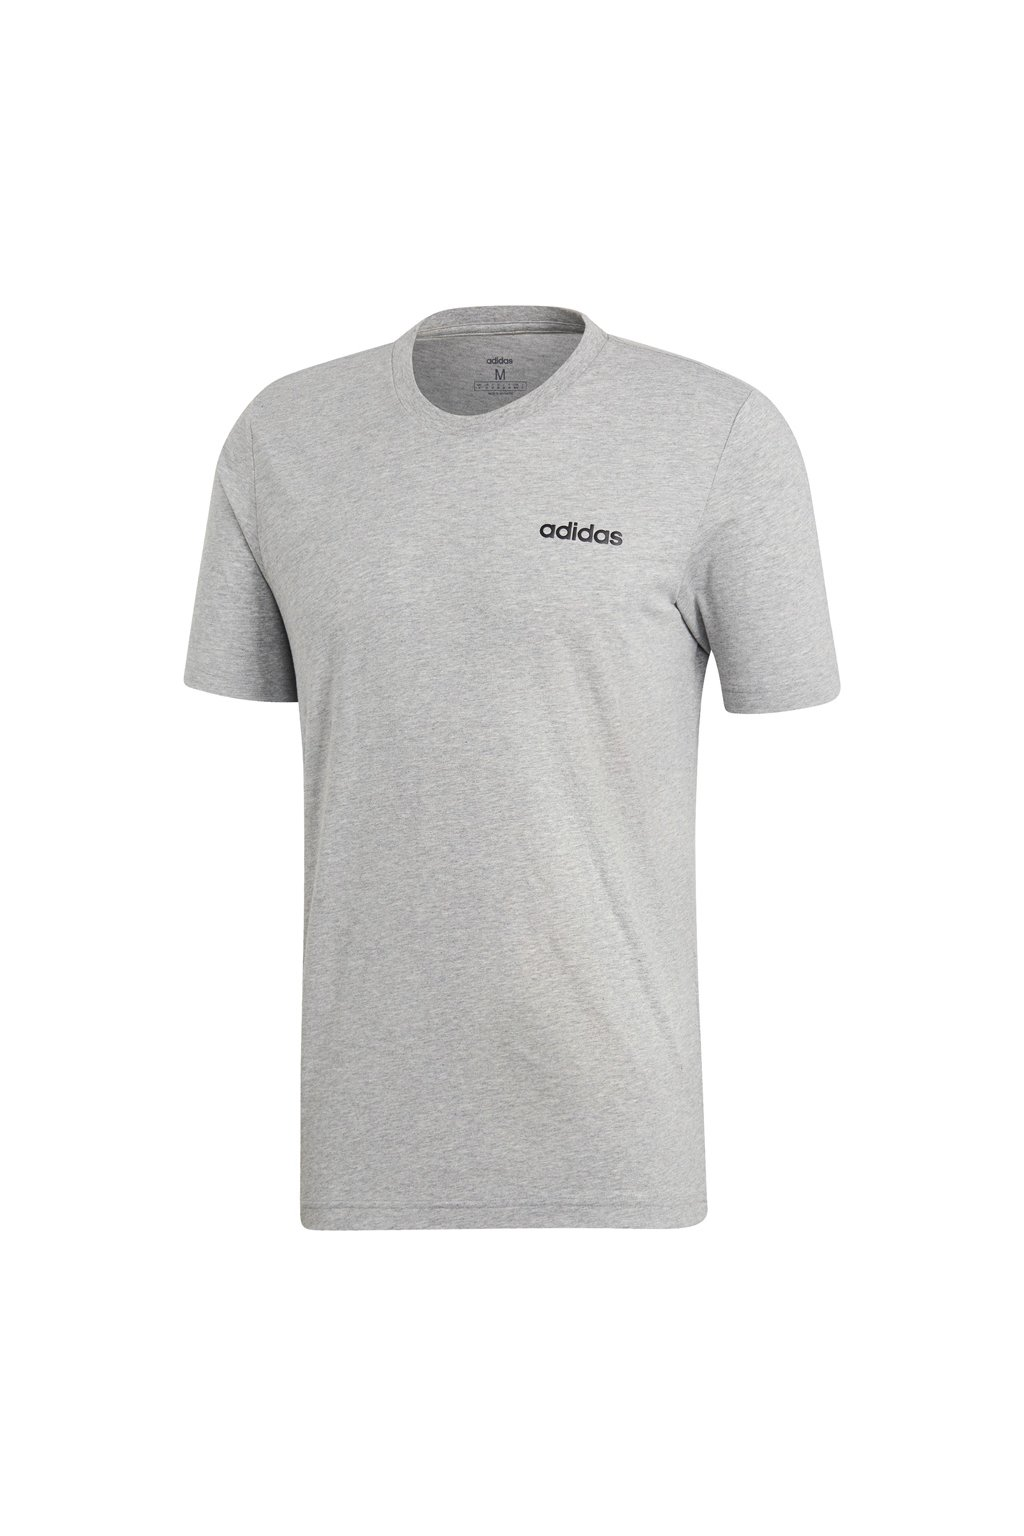 Pánske tričko Adidas Essentials Plain Tee DU0382